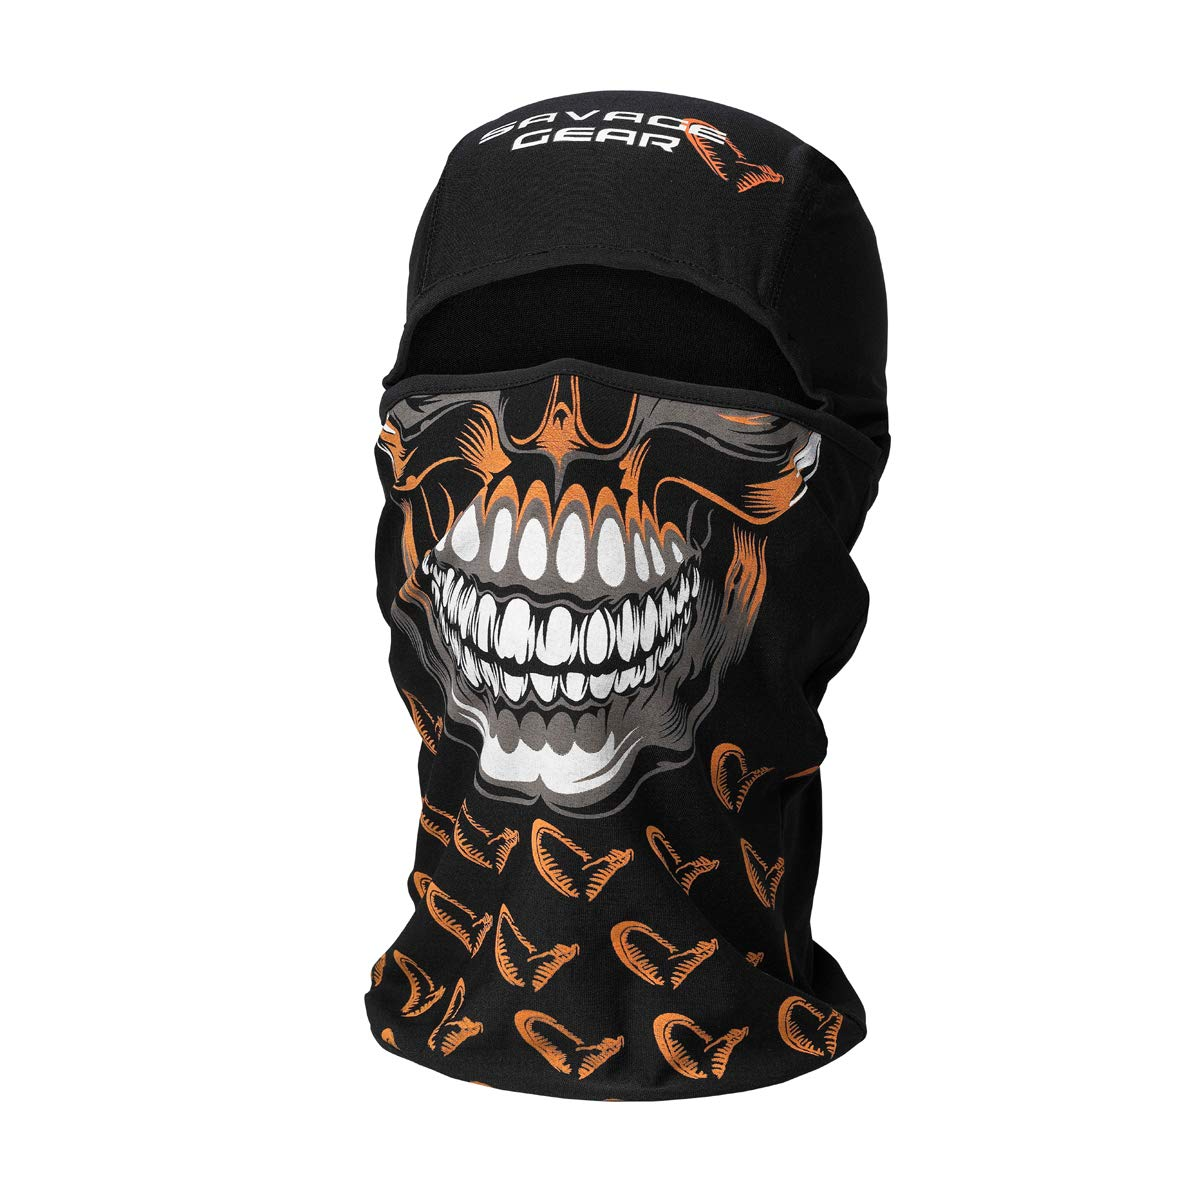 Savage Gear Skull Balaclava Black